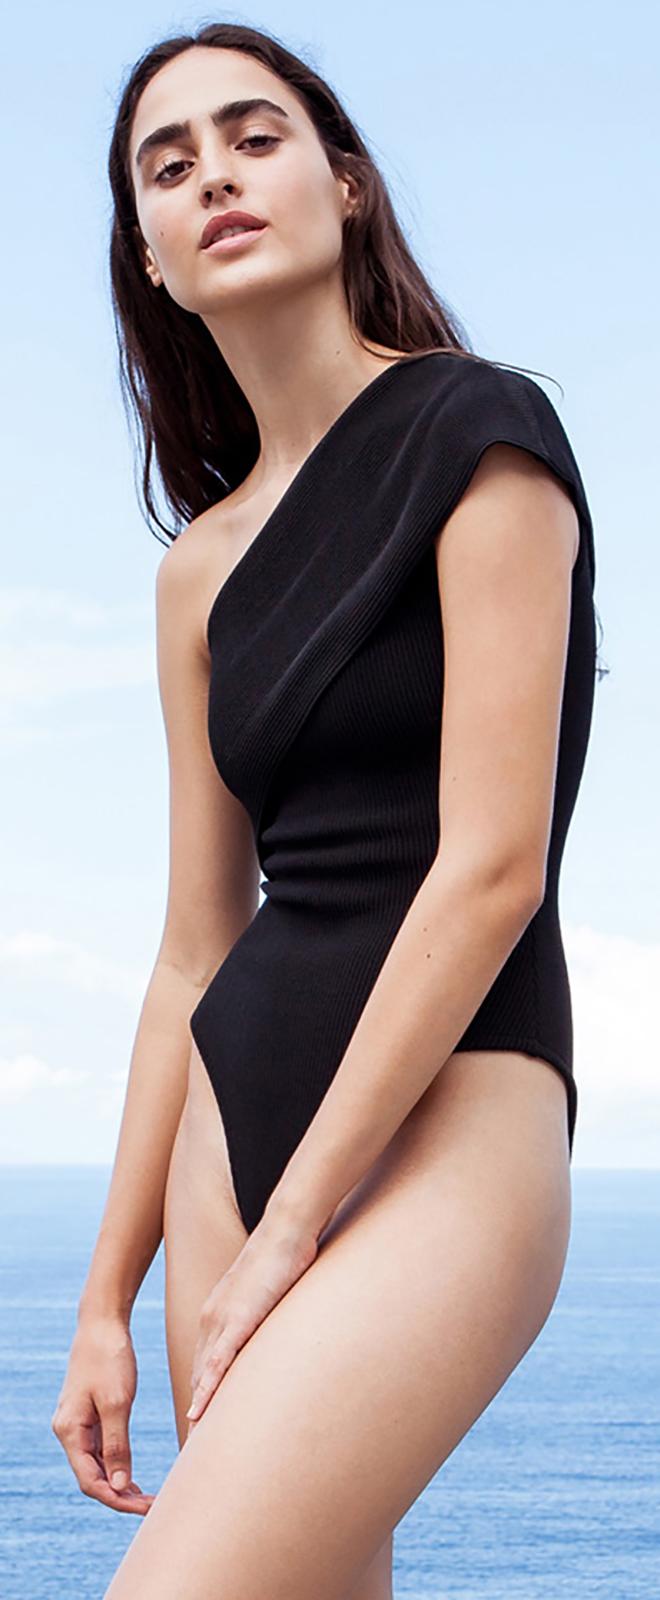 92a32b2fcd3df ... Black tricot knit asymmetric one-piece swimsuit - MAIÔ TRICOT TEP PRETO  ...